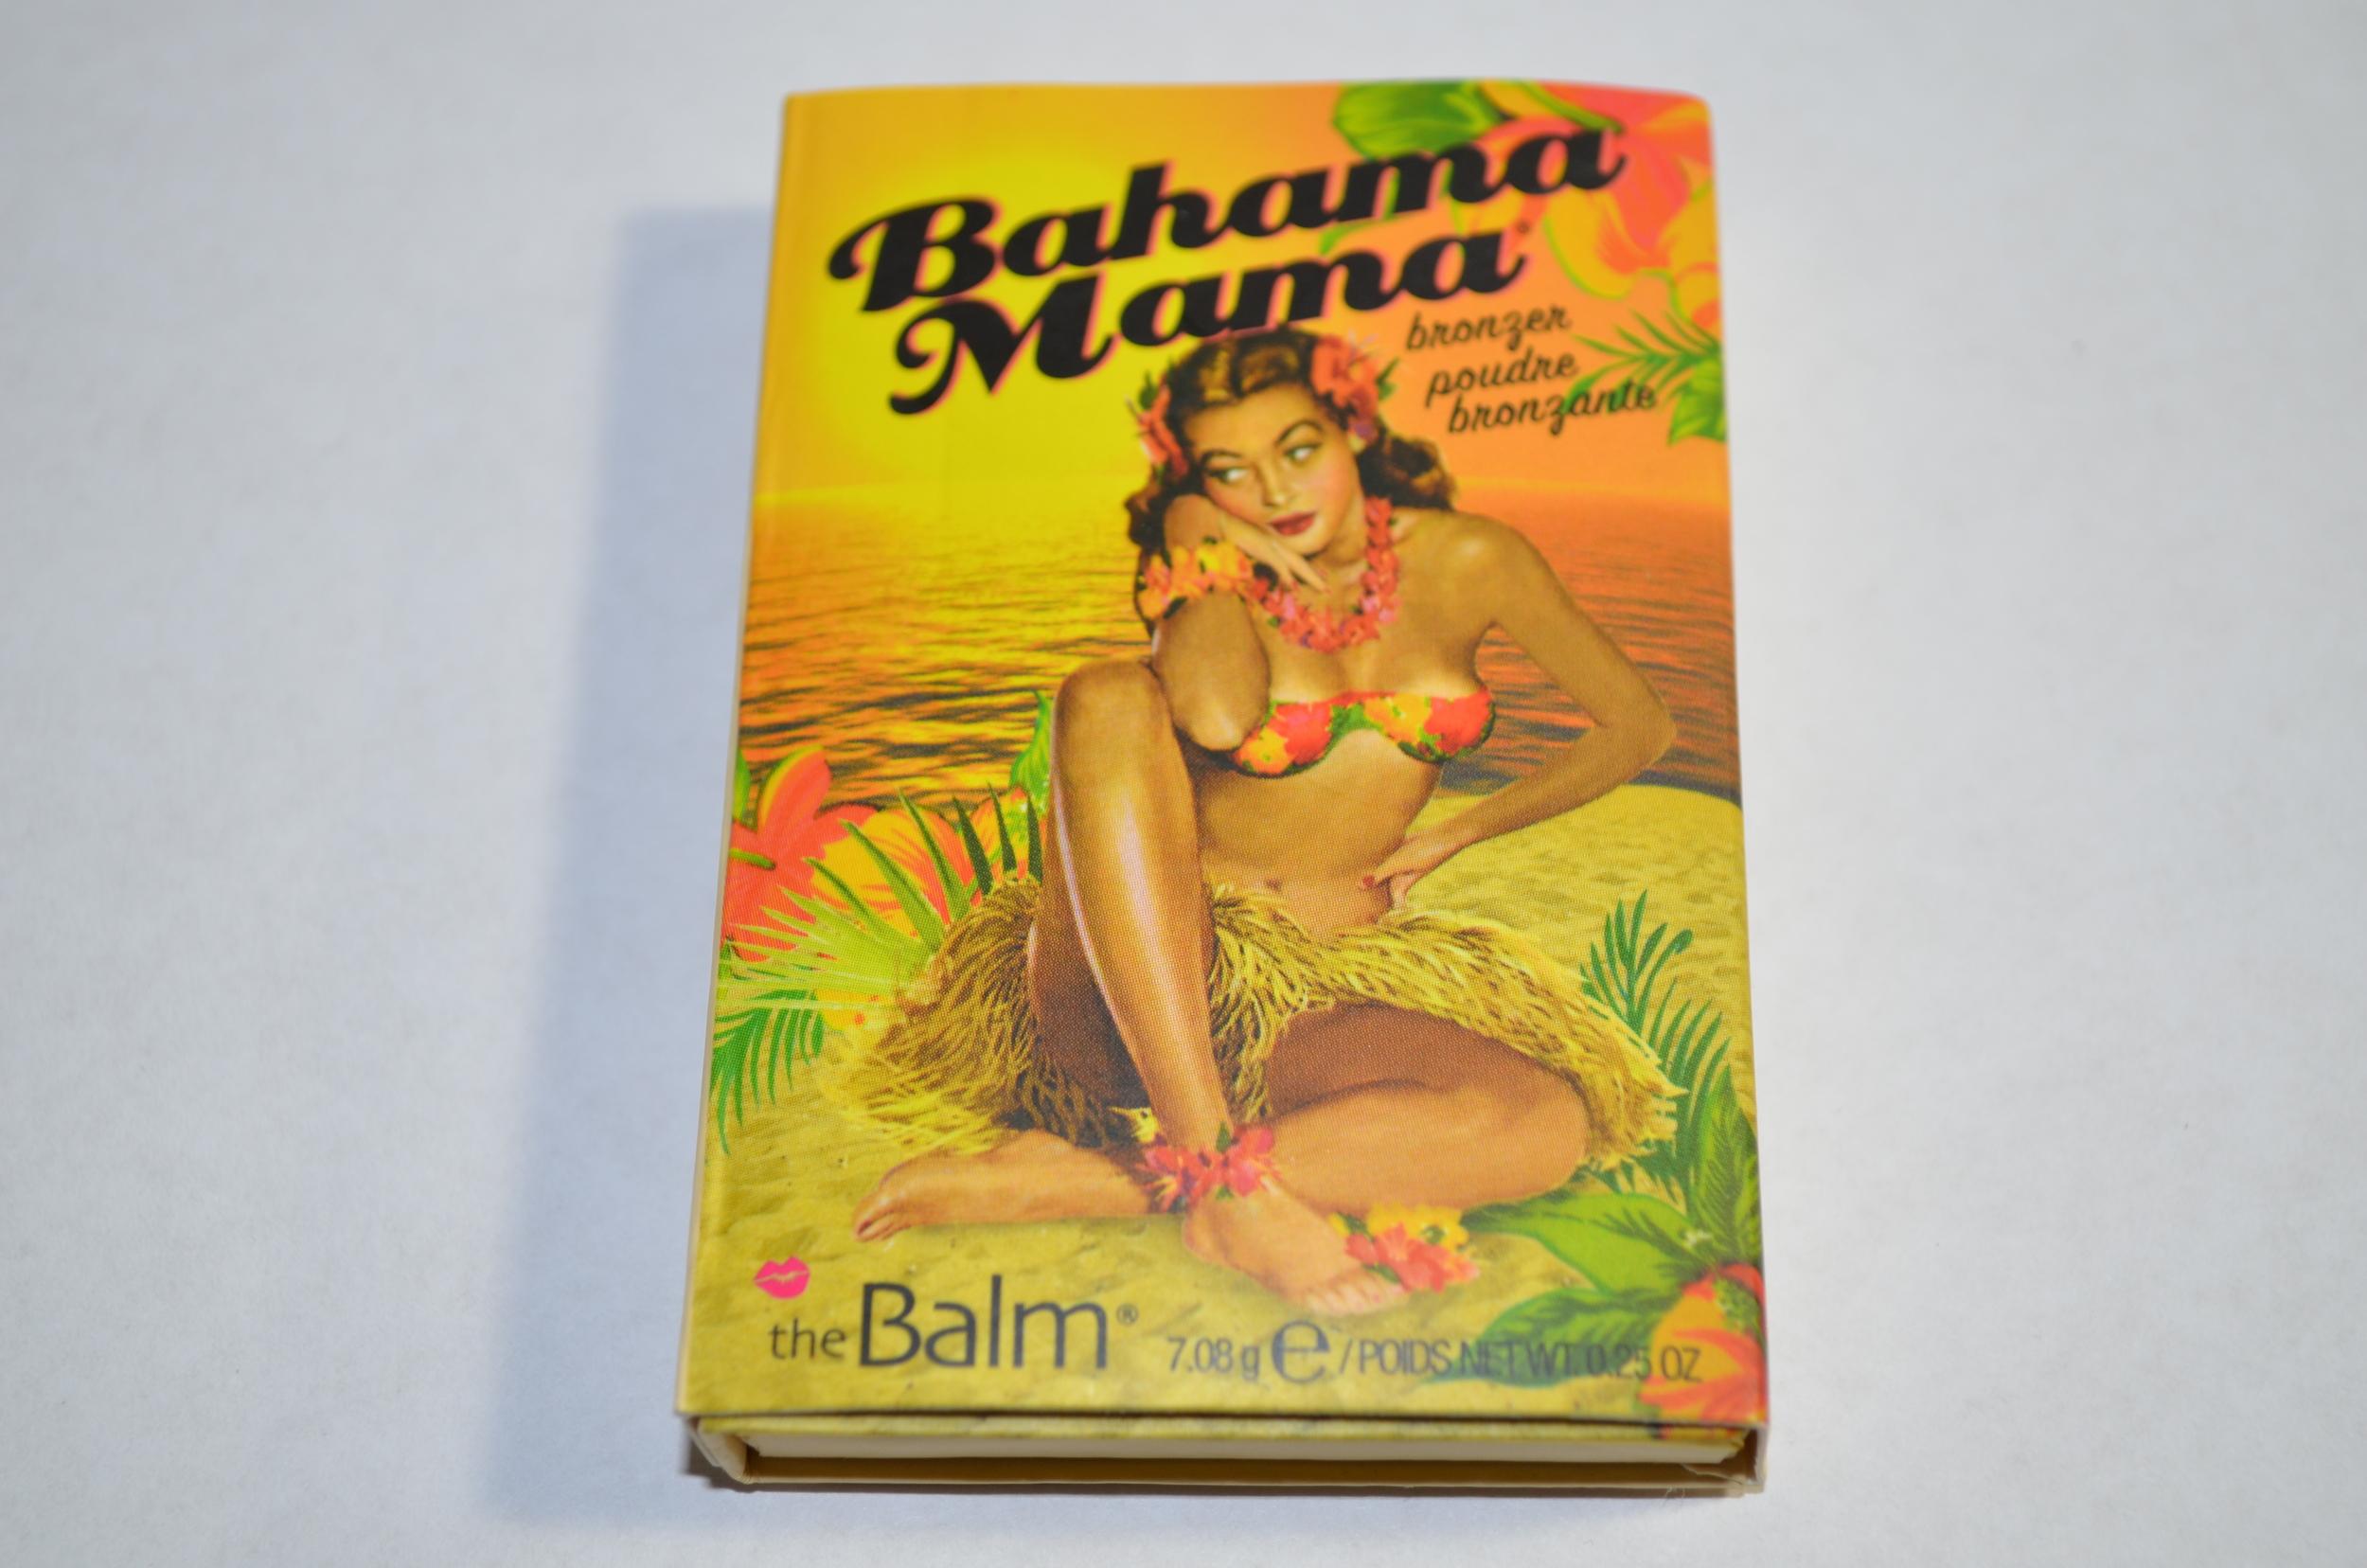 thebalm bahama mama review